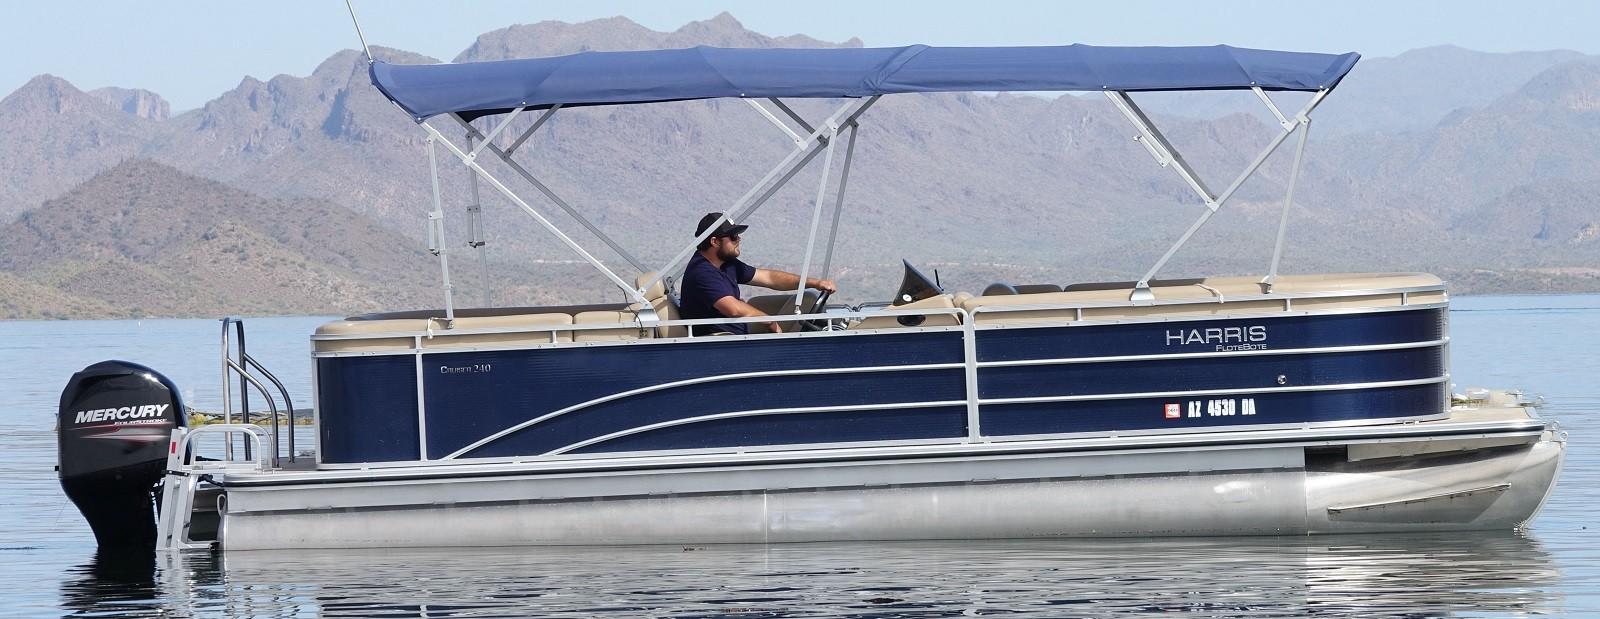 100 92 best fishing pontoon boat about us u2013 encore for Best fishing pontoon boat